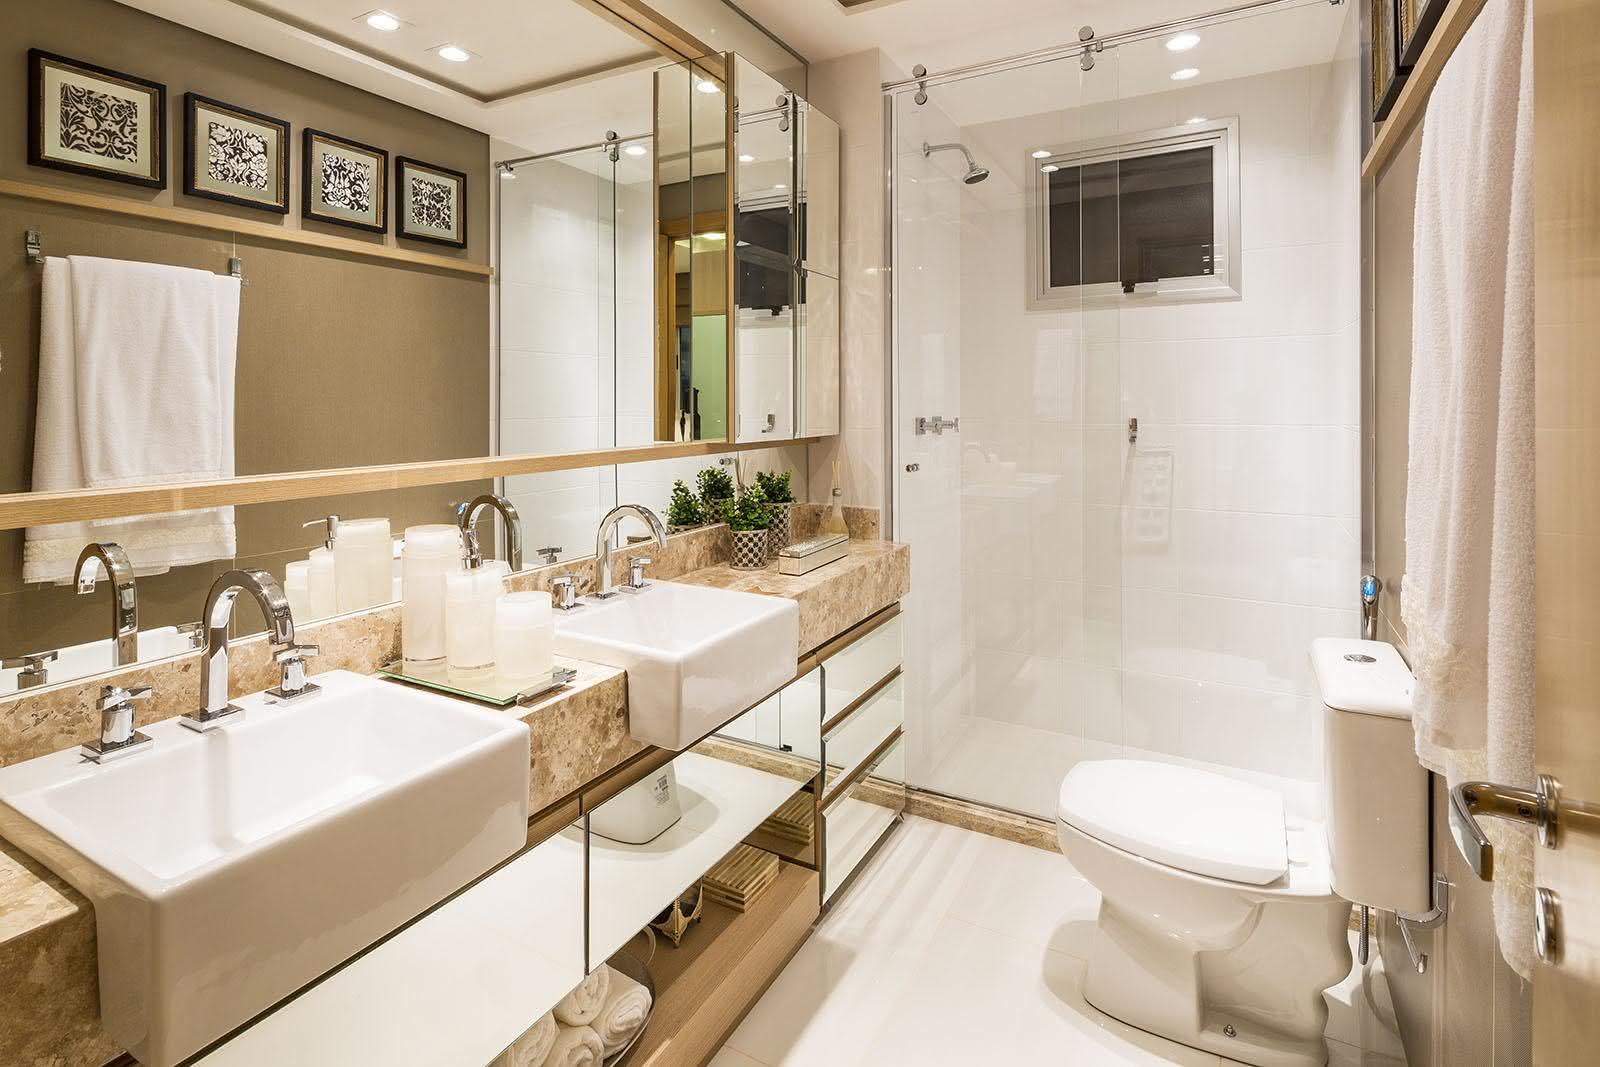 #515924 50 Bancadas de Banheiros e Lavabos para te Inspirar 1600x1067 px Banheiros Modernos E Pequenos 2013 721